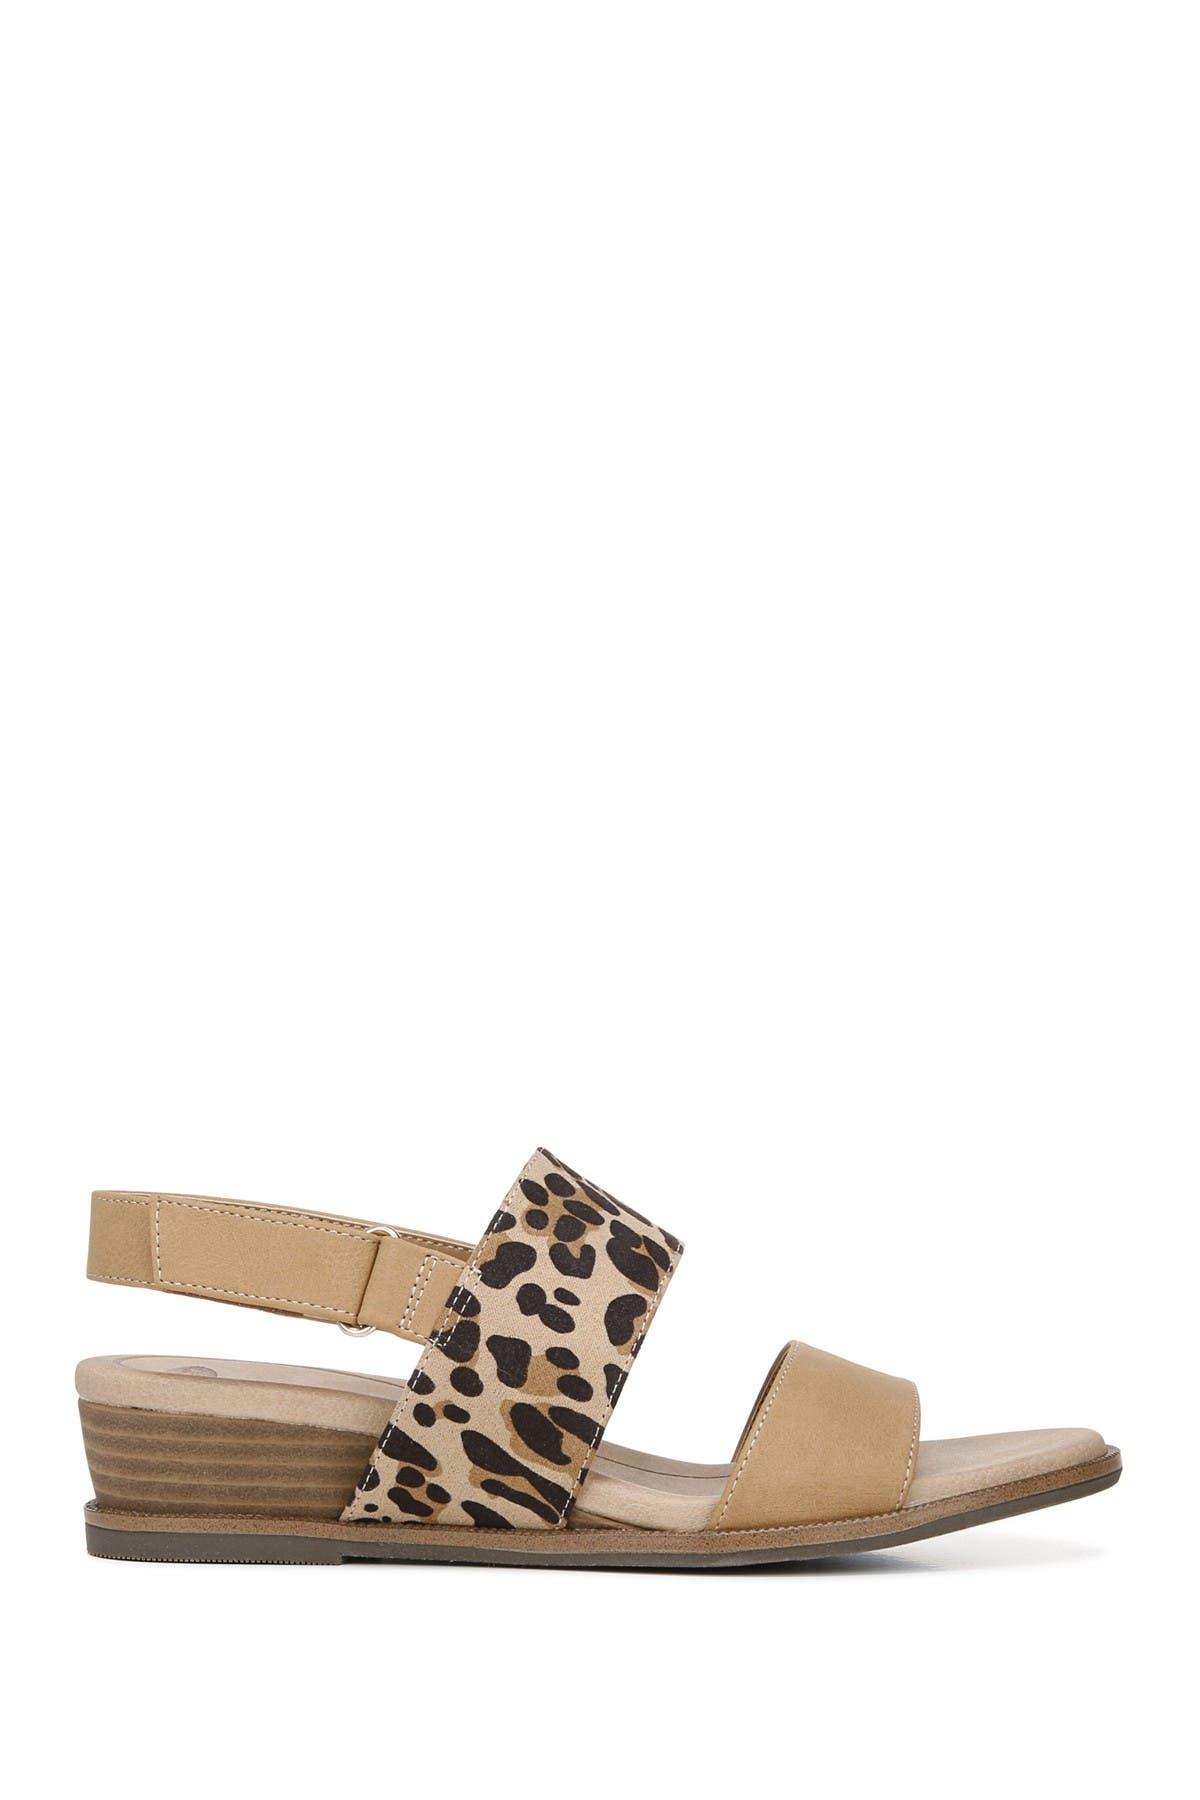 Freeform Leopard Print Wedge Sandal